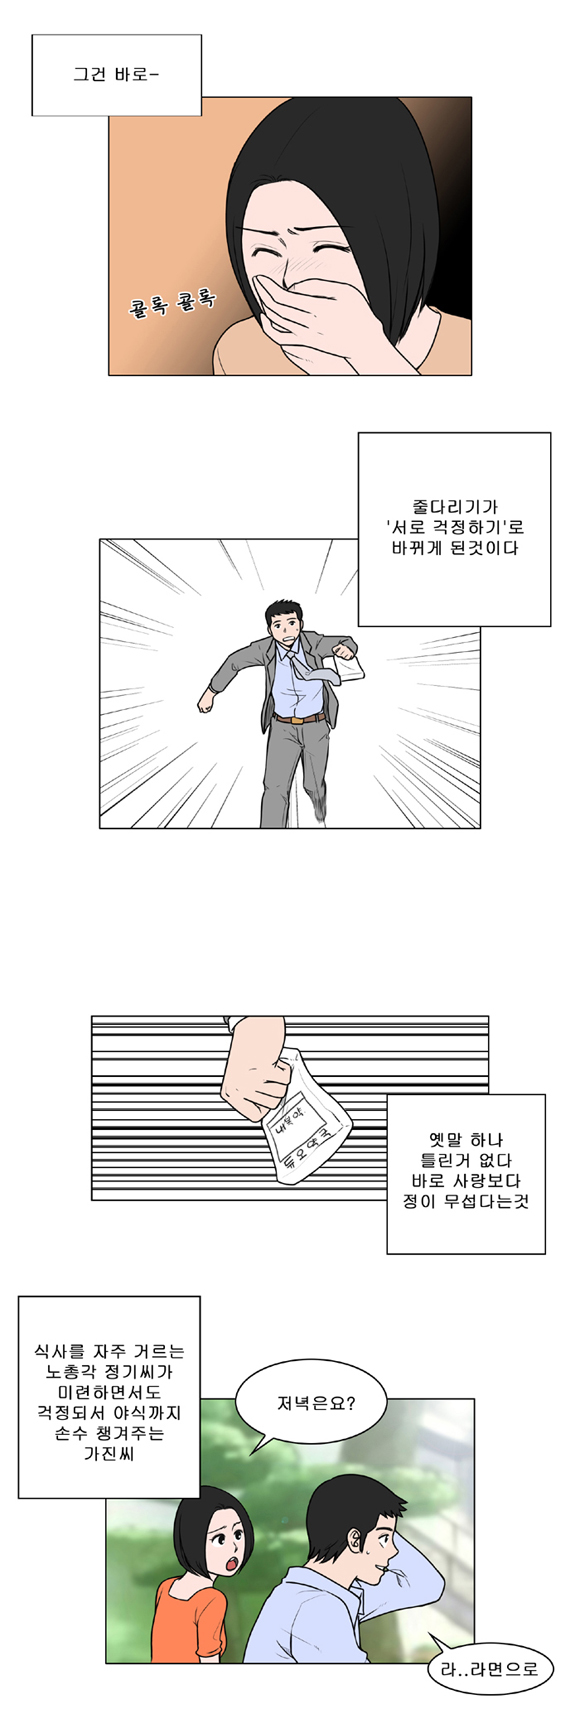 duocartoon_16_05.jpg